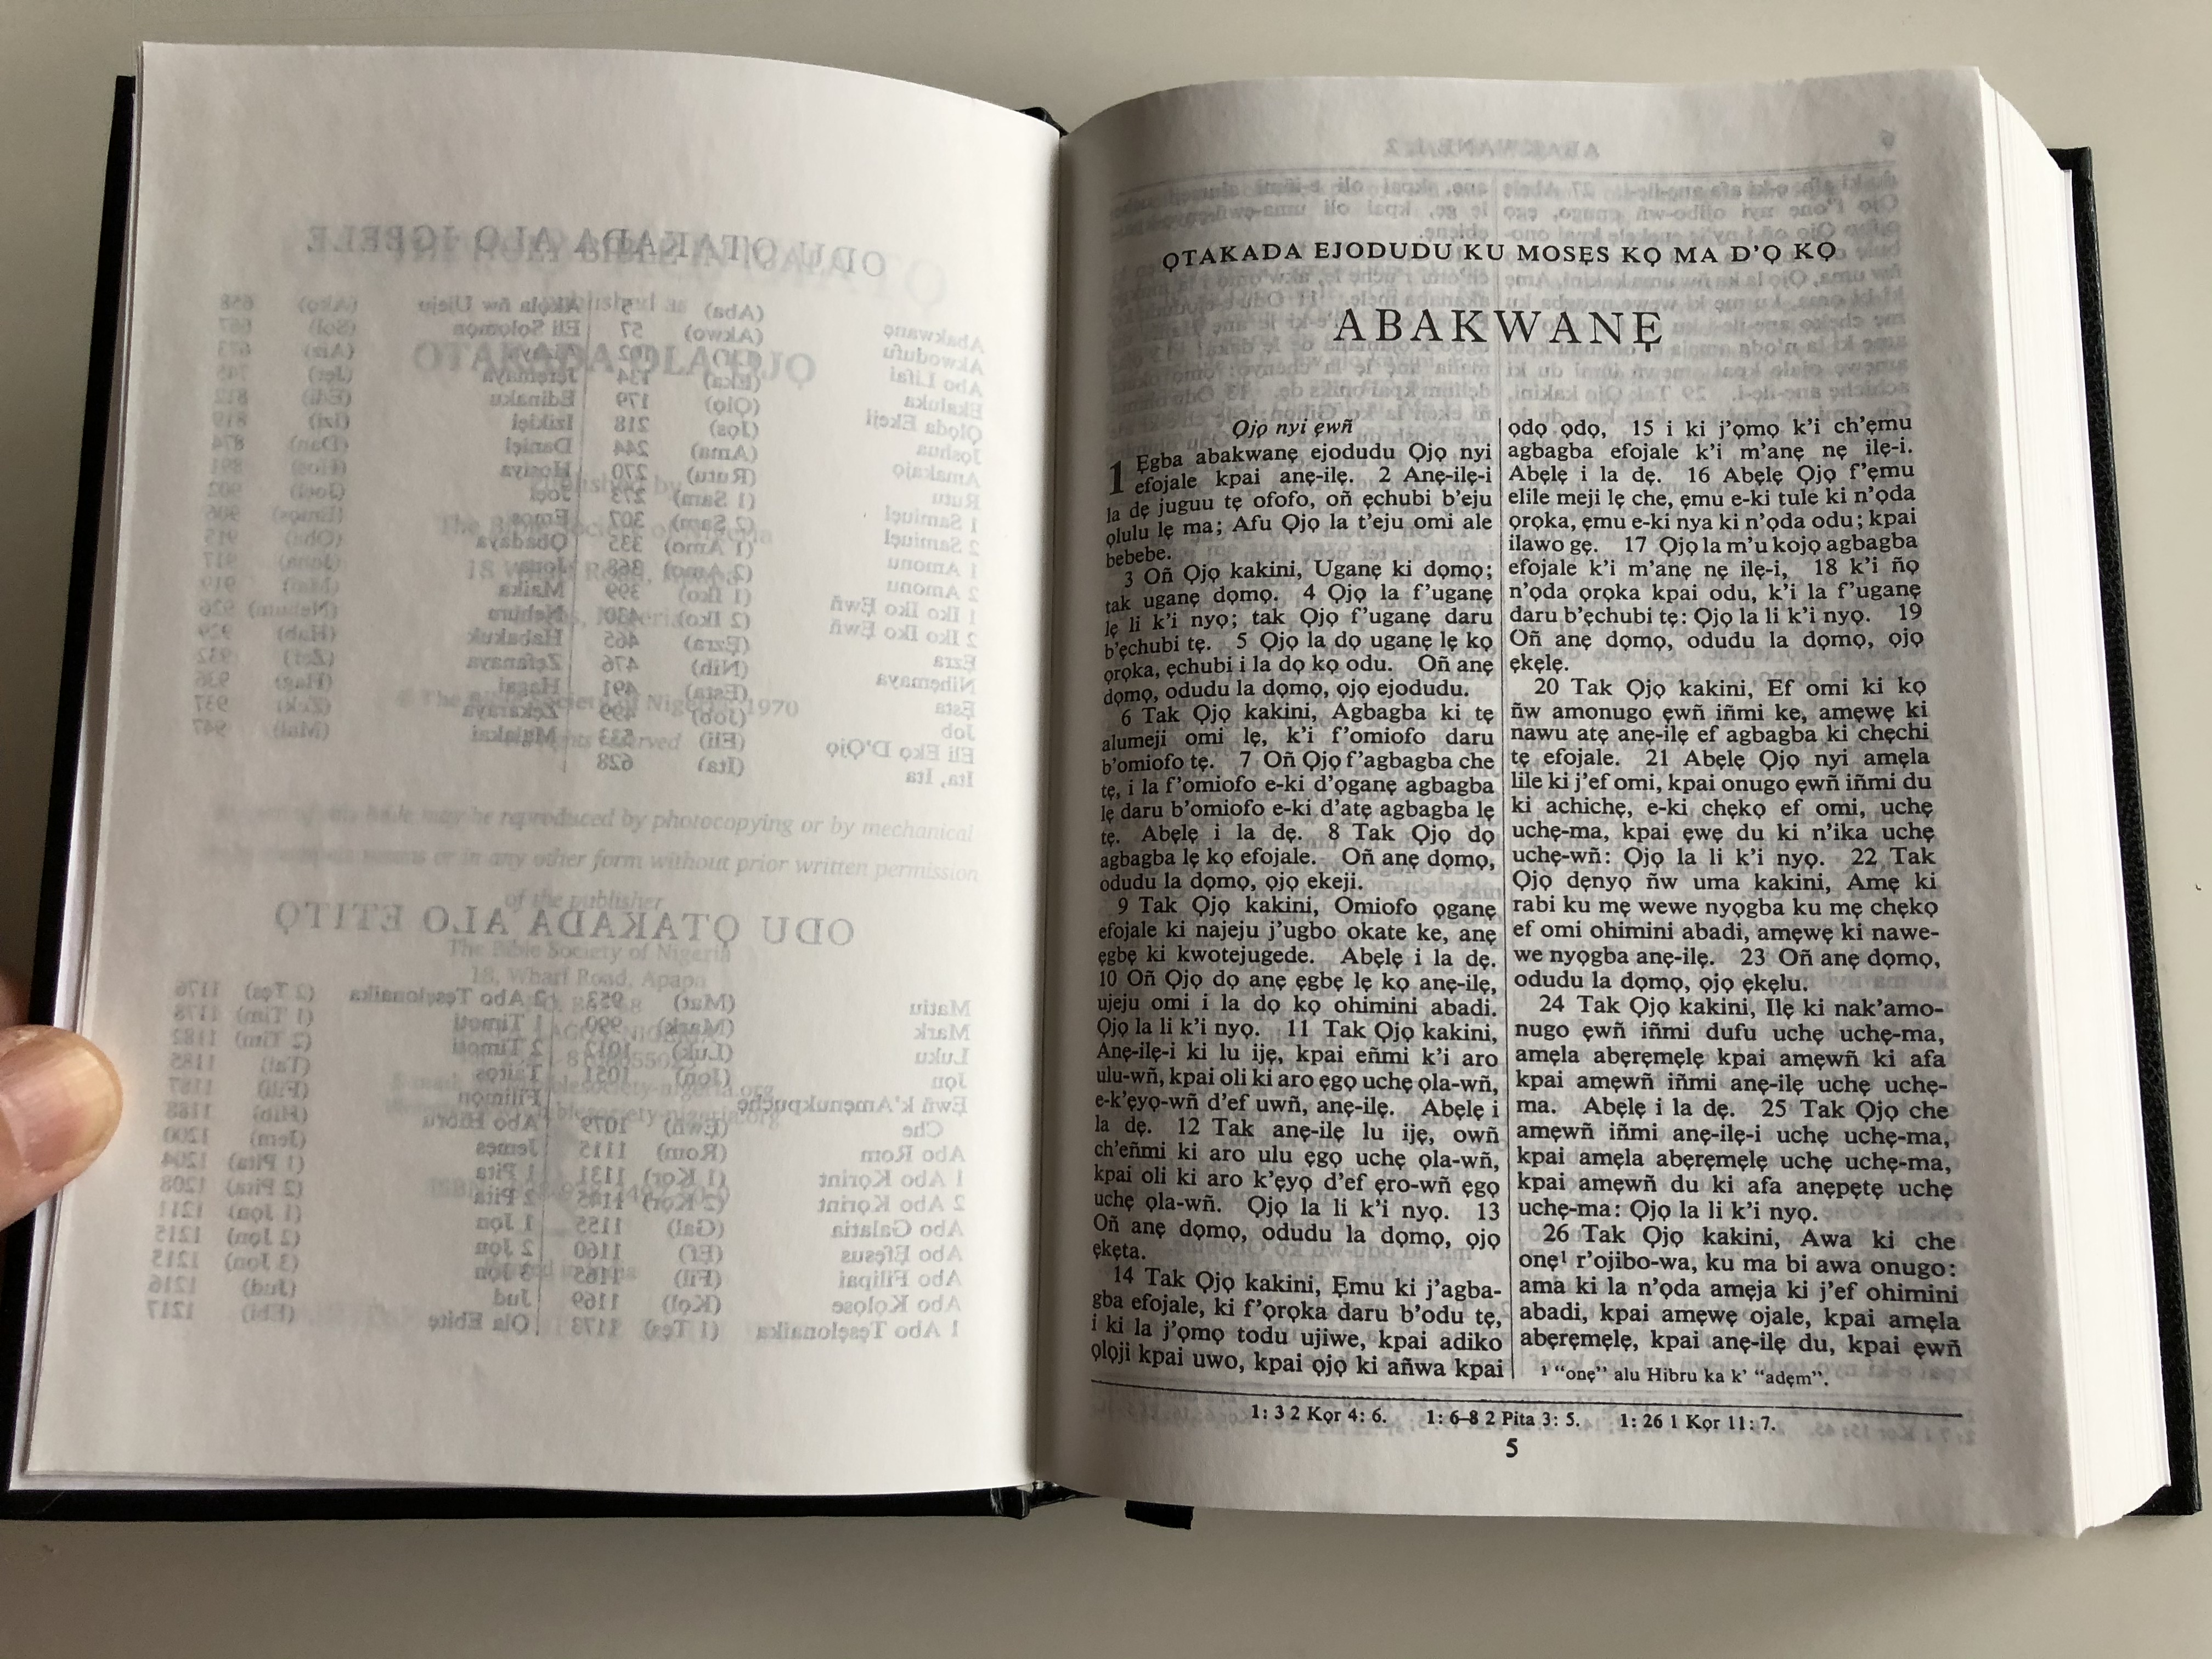 otakada-ola-ojo-holy-bible-in-igala-bible-society-of-nigeria-1970-05.jpg